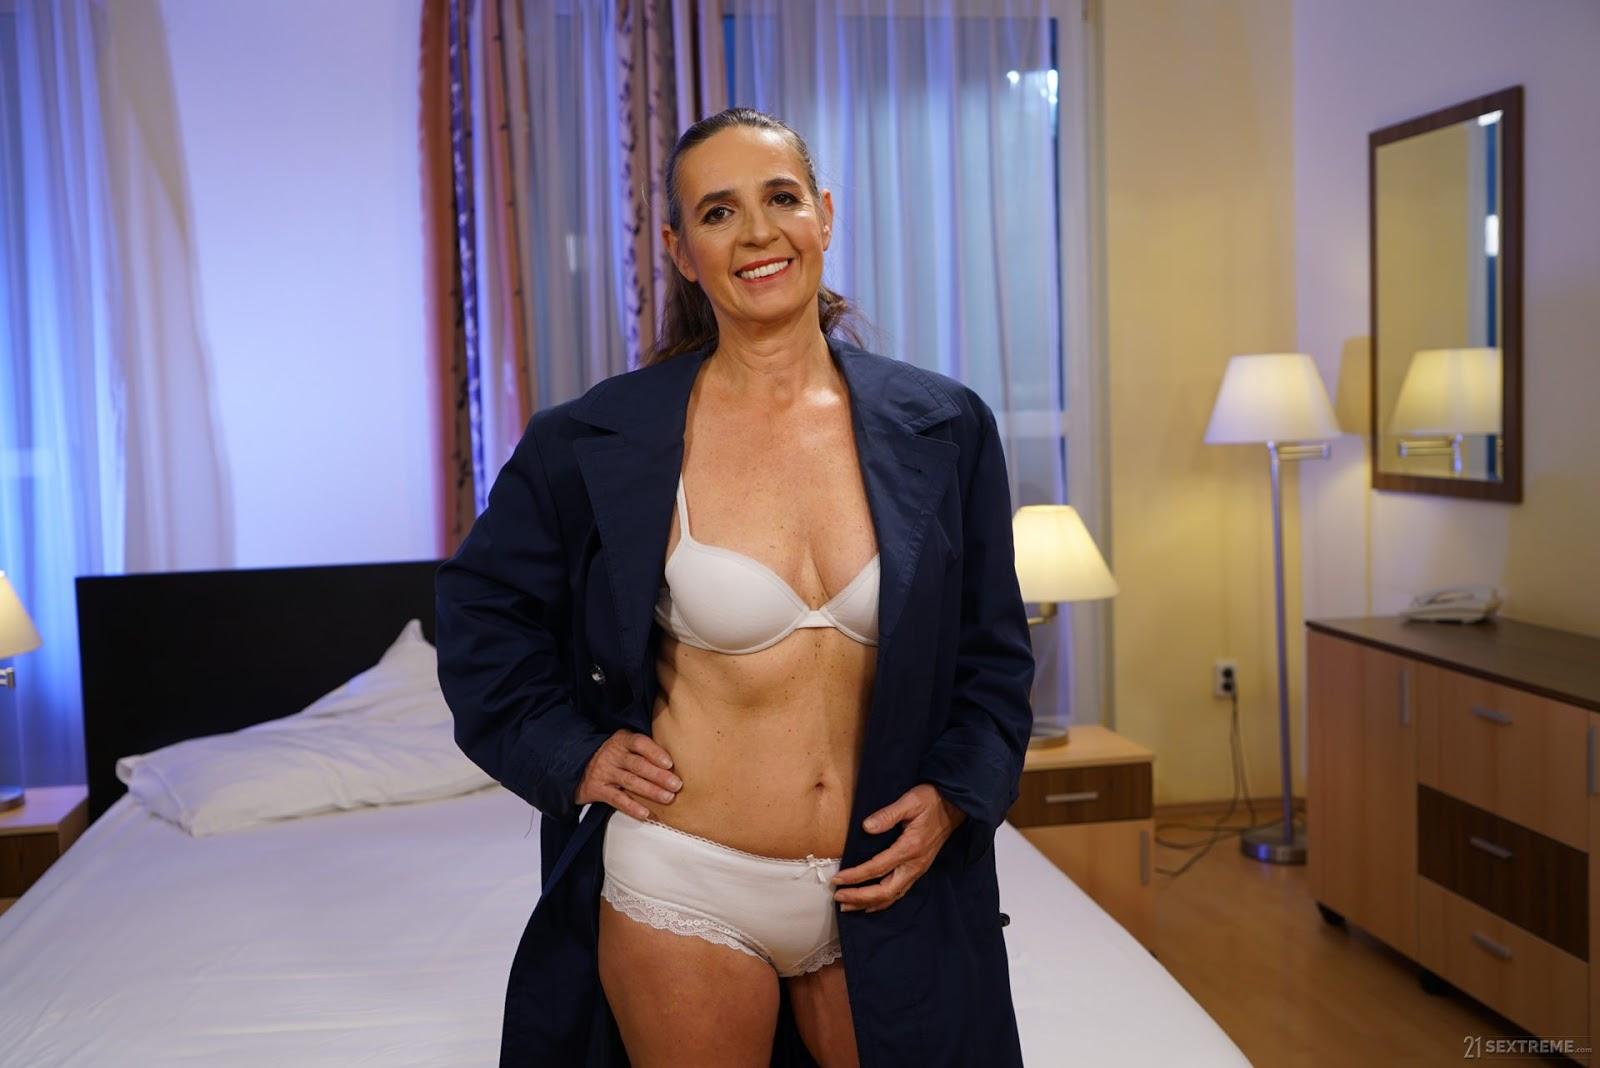 Grannys Secret Date,21 SEXTREME, 4K, Anal, Threesome, Uncensored, Westen, Westen Porn,Mugur,Mariana, Milf